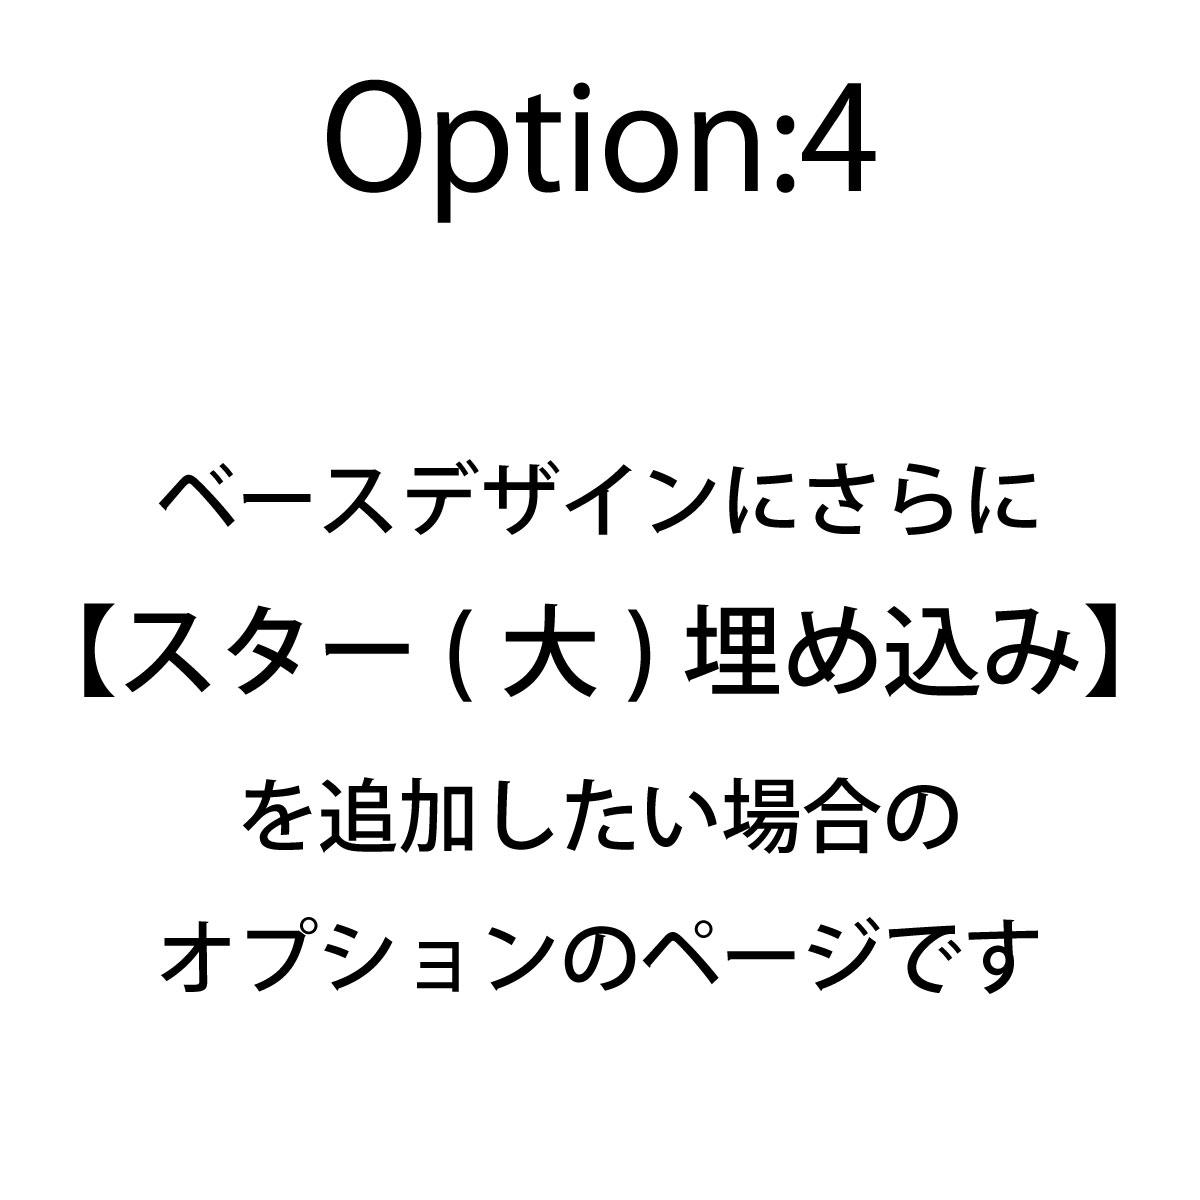 iPhoneOpenCase:    Option4:スター(大)埋込追加